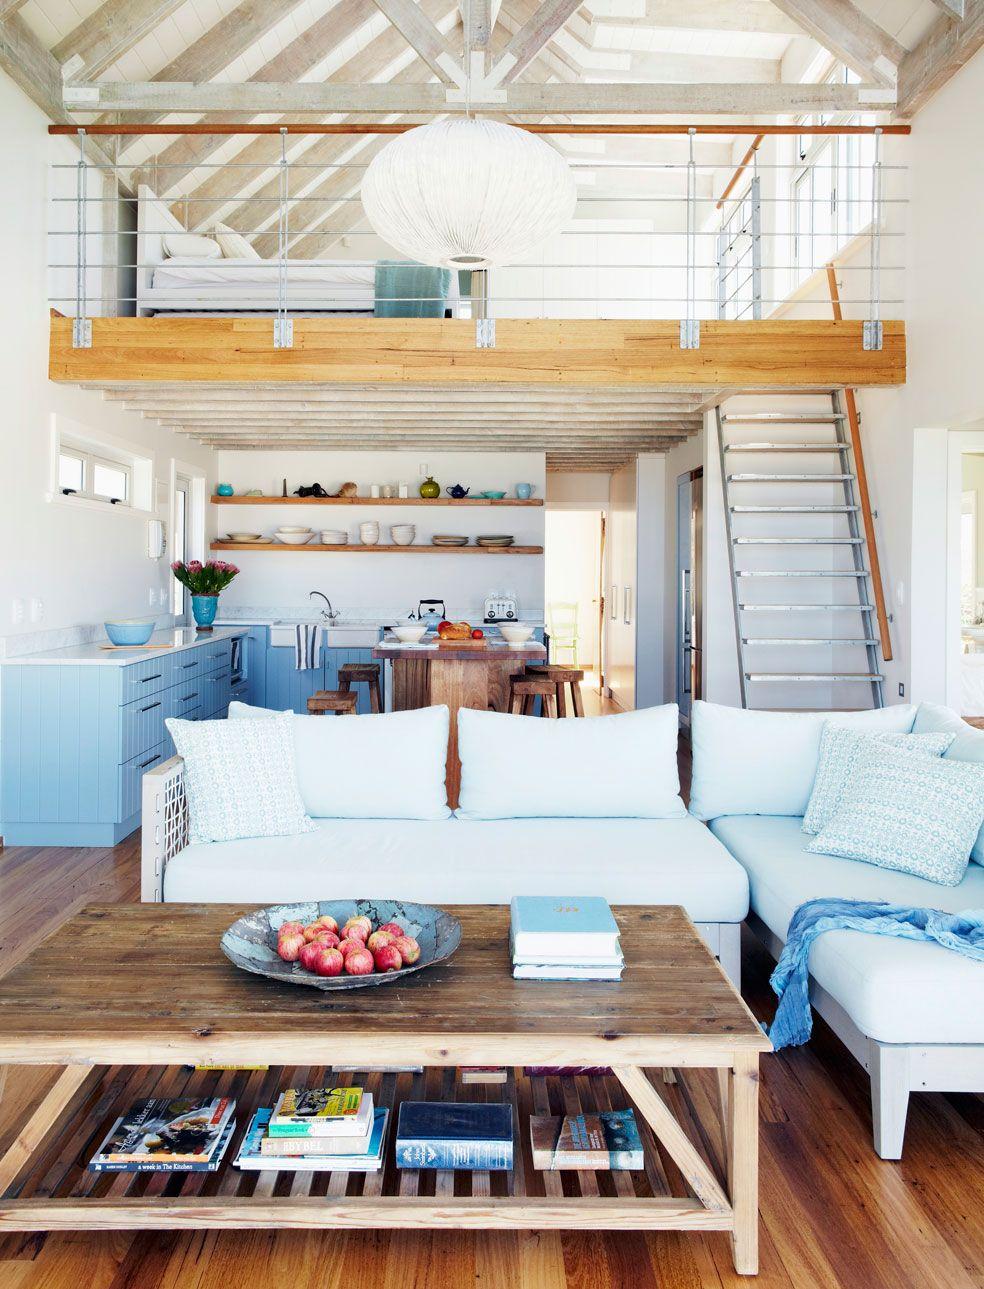 decora o de praia madeira e tons de azul home pinterest haus kleine wohnung und wohnen. Black Bedroom Furniture Sets. Home Design Ideas